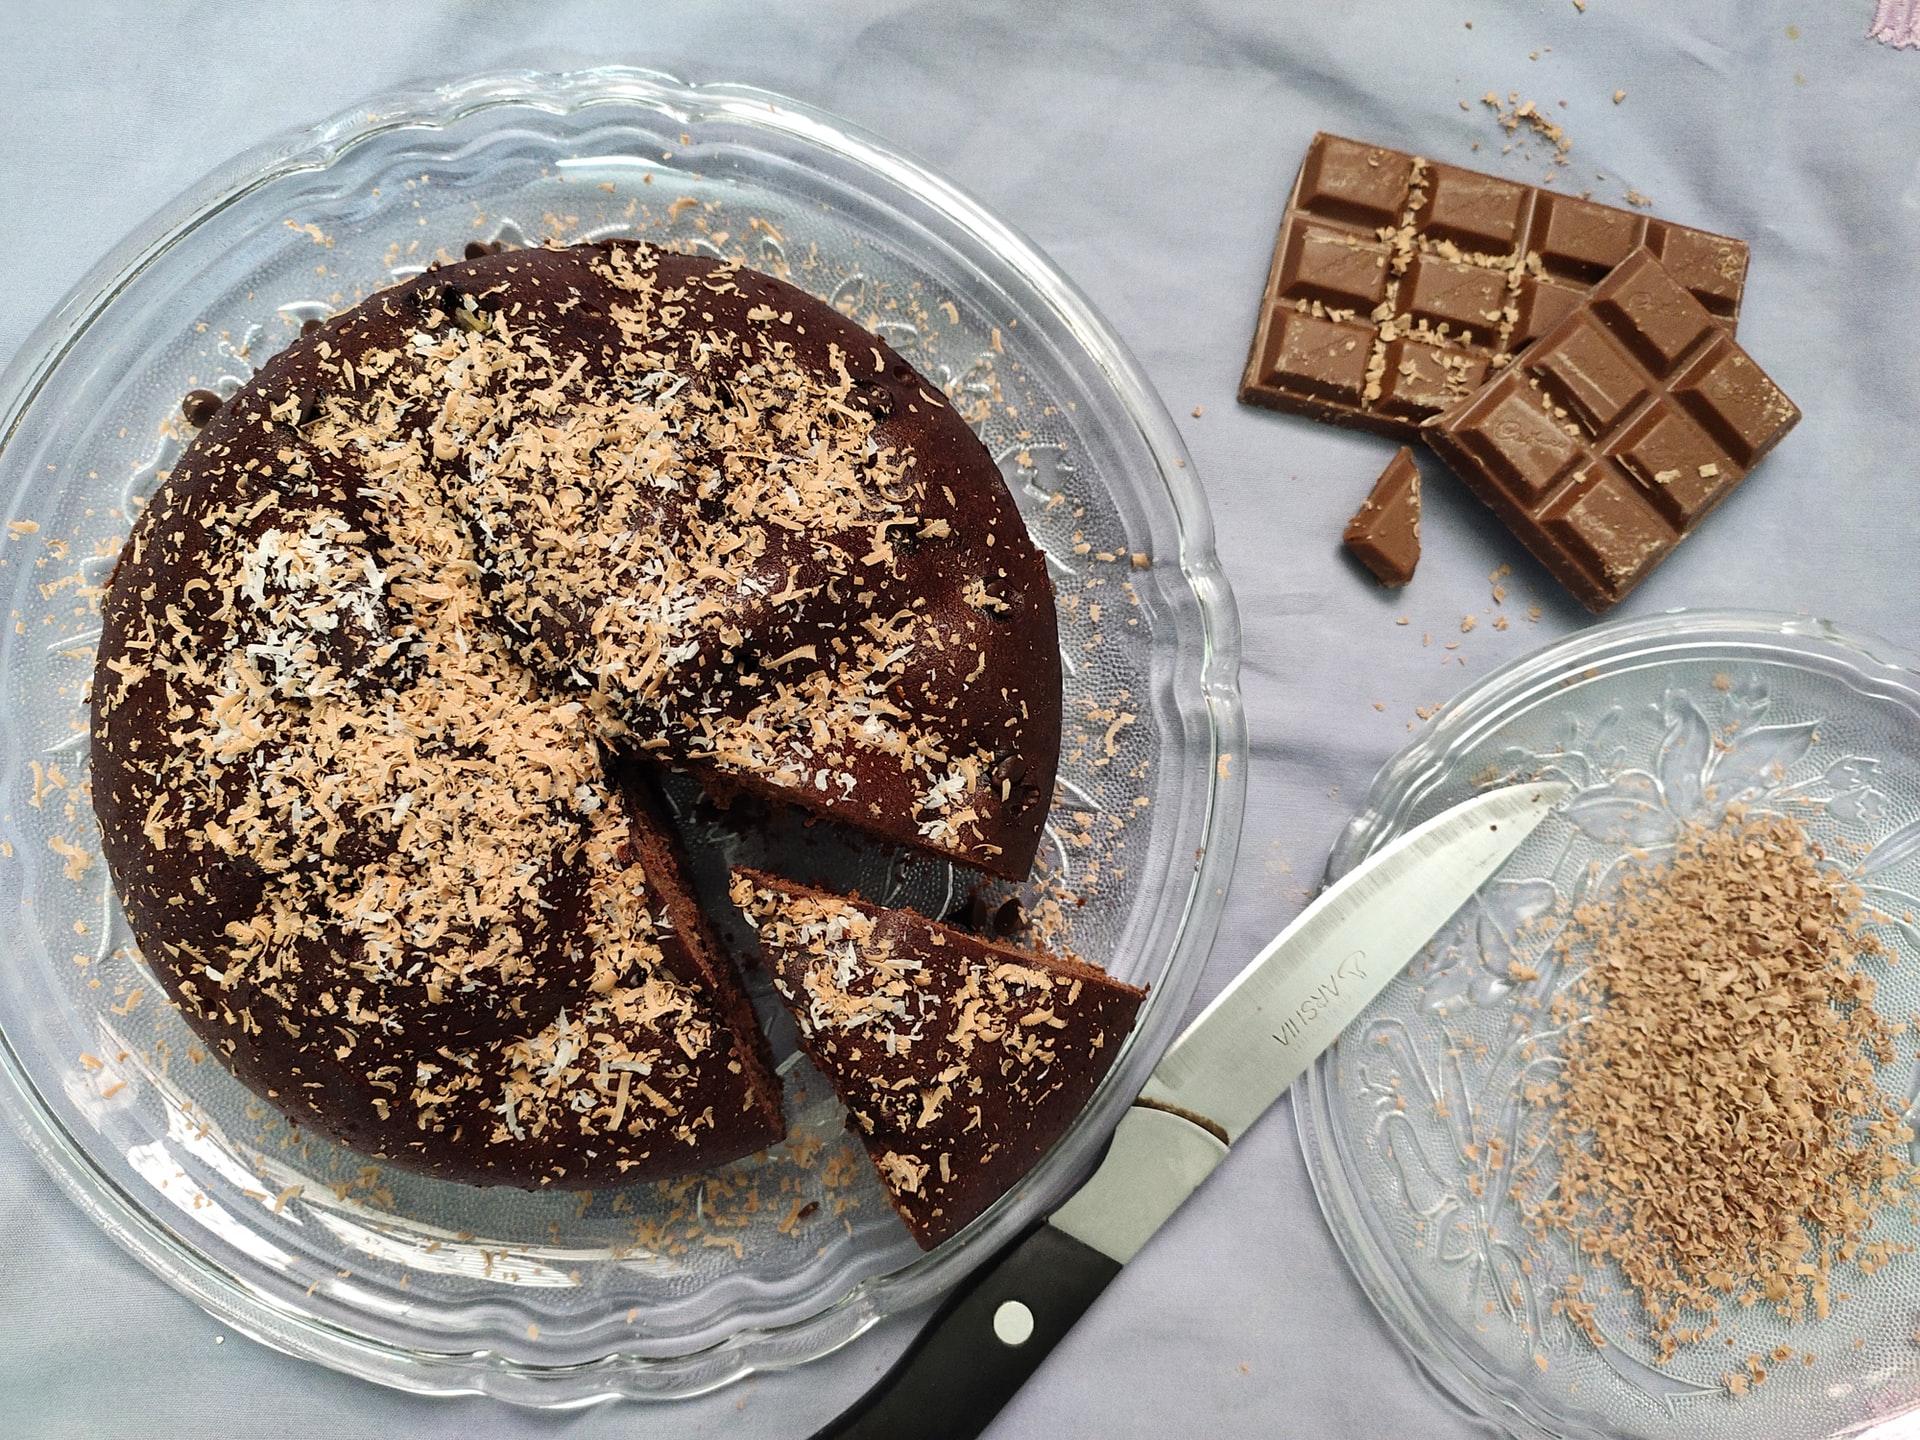 torta al cioccolato al latte